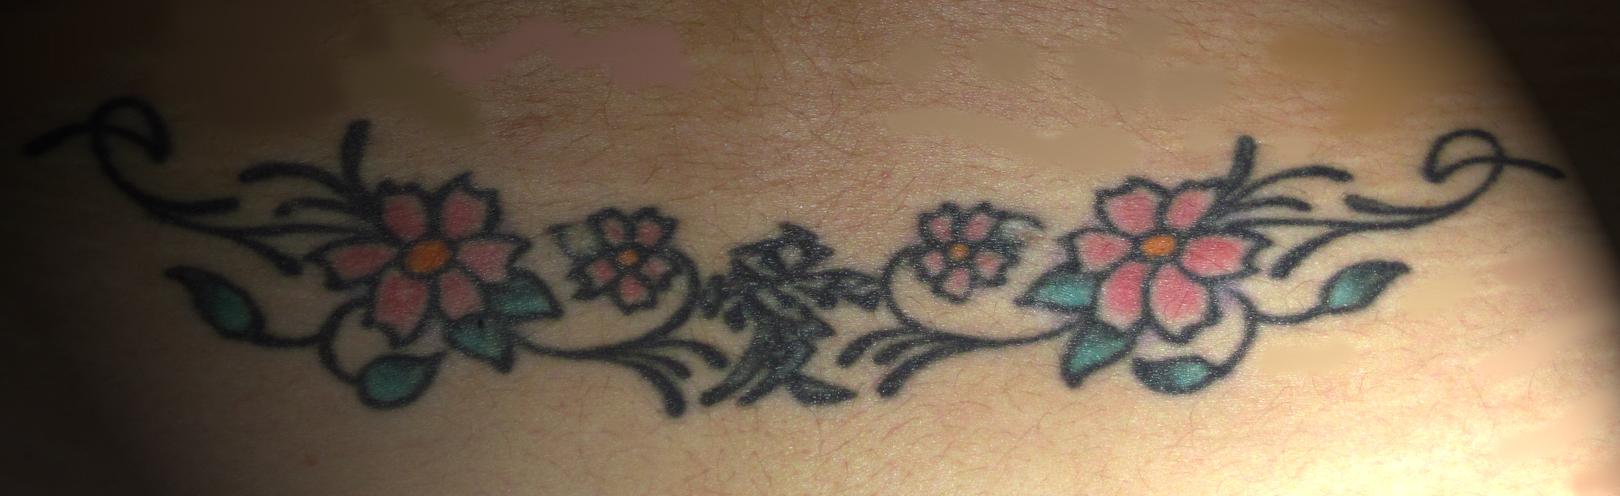 Tattoo webcam